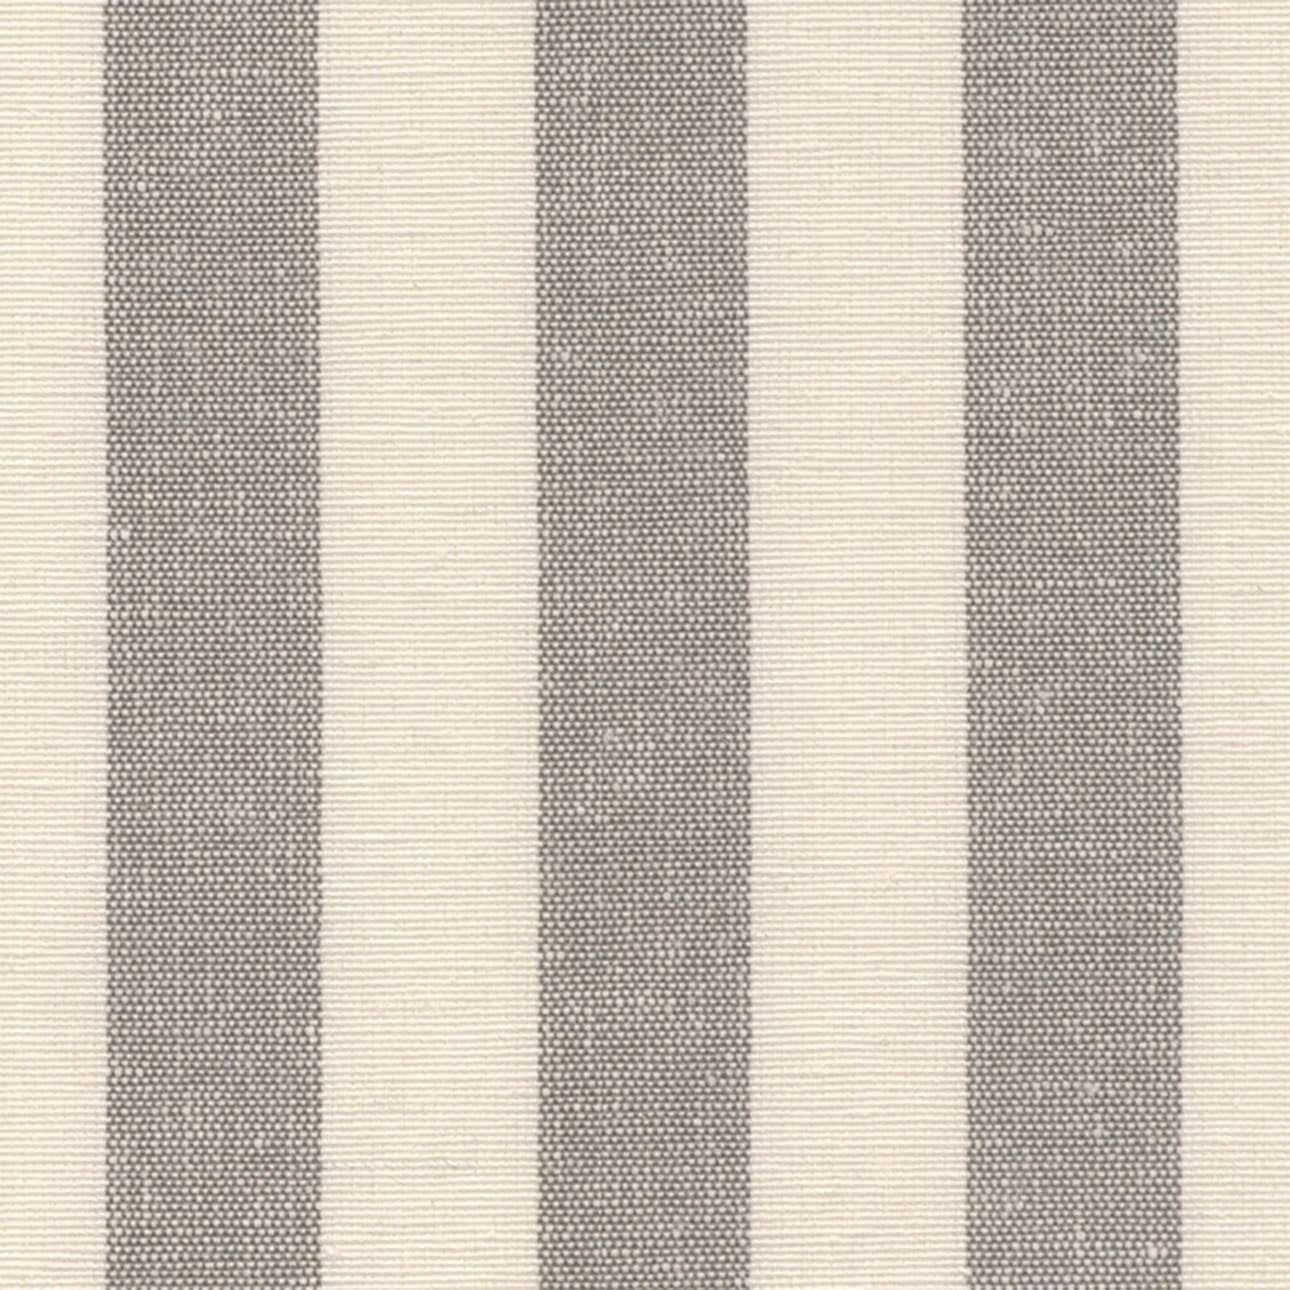 Roleta rzymska Torino w kolekcji Quadro, tkanina: 136-12